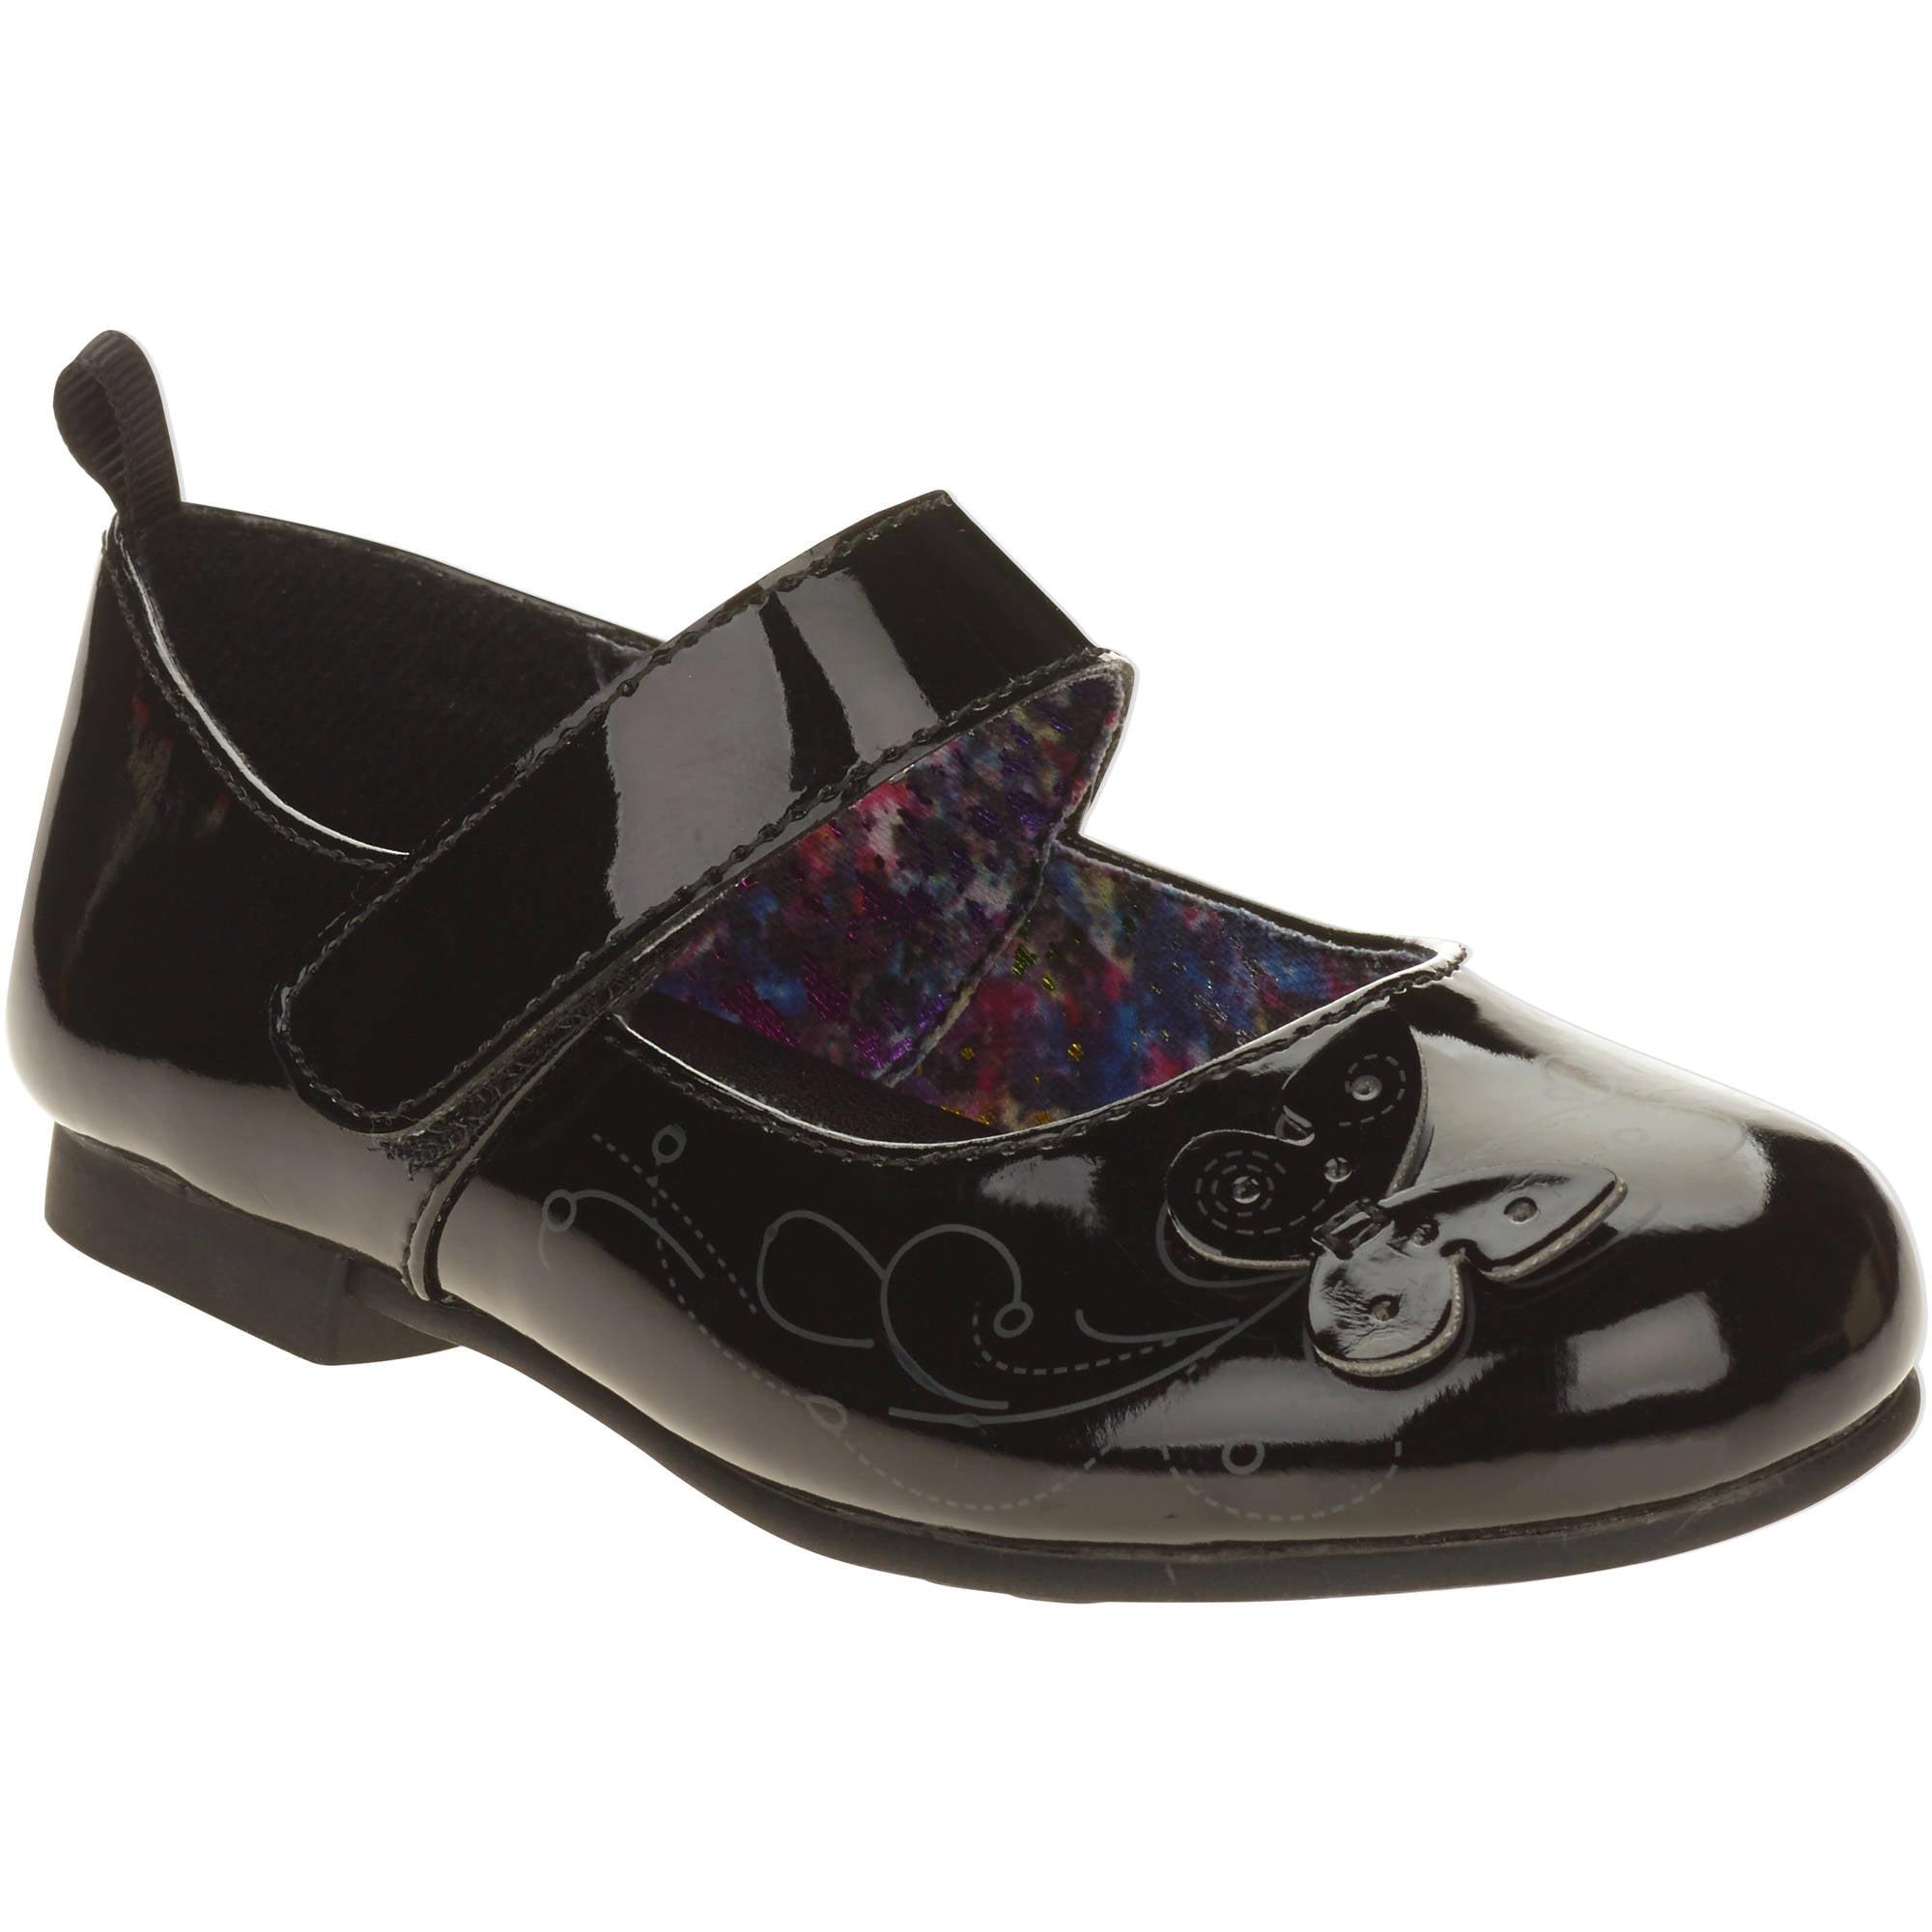 George Toddler Girls' Mary Jane Dress Shoe